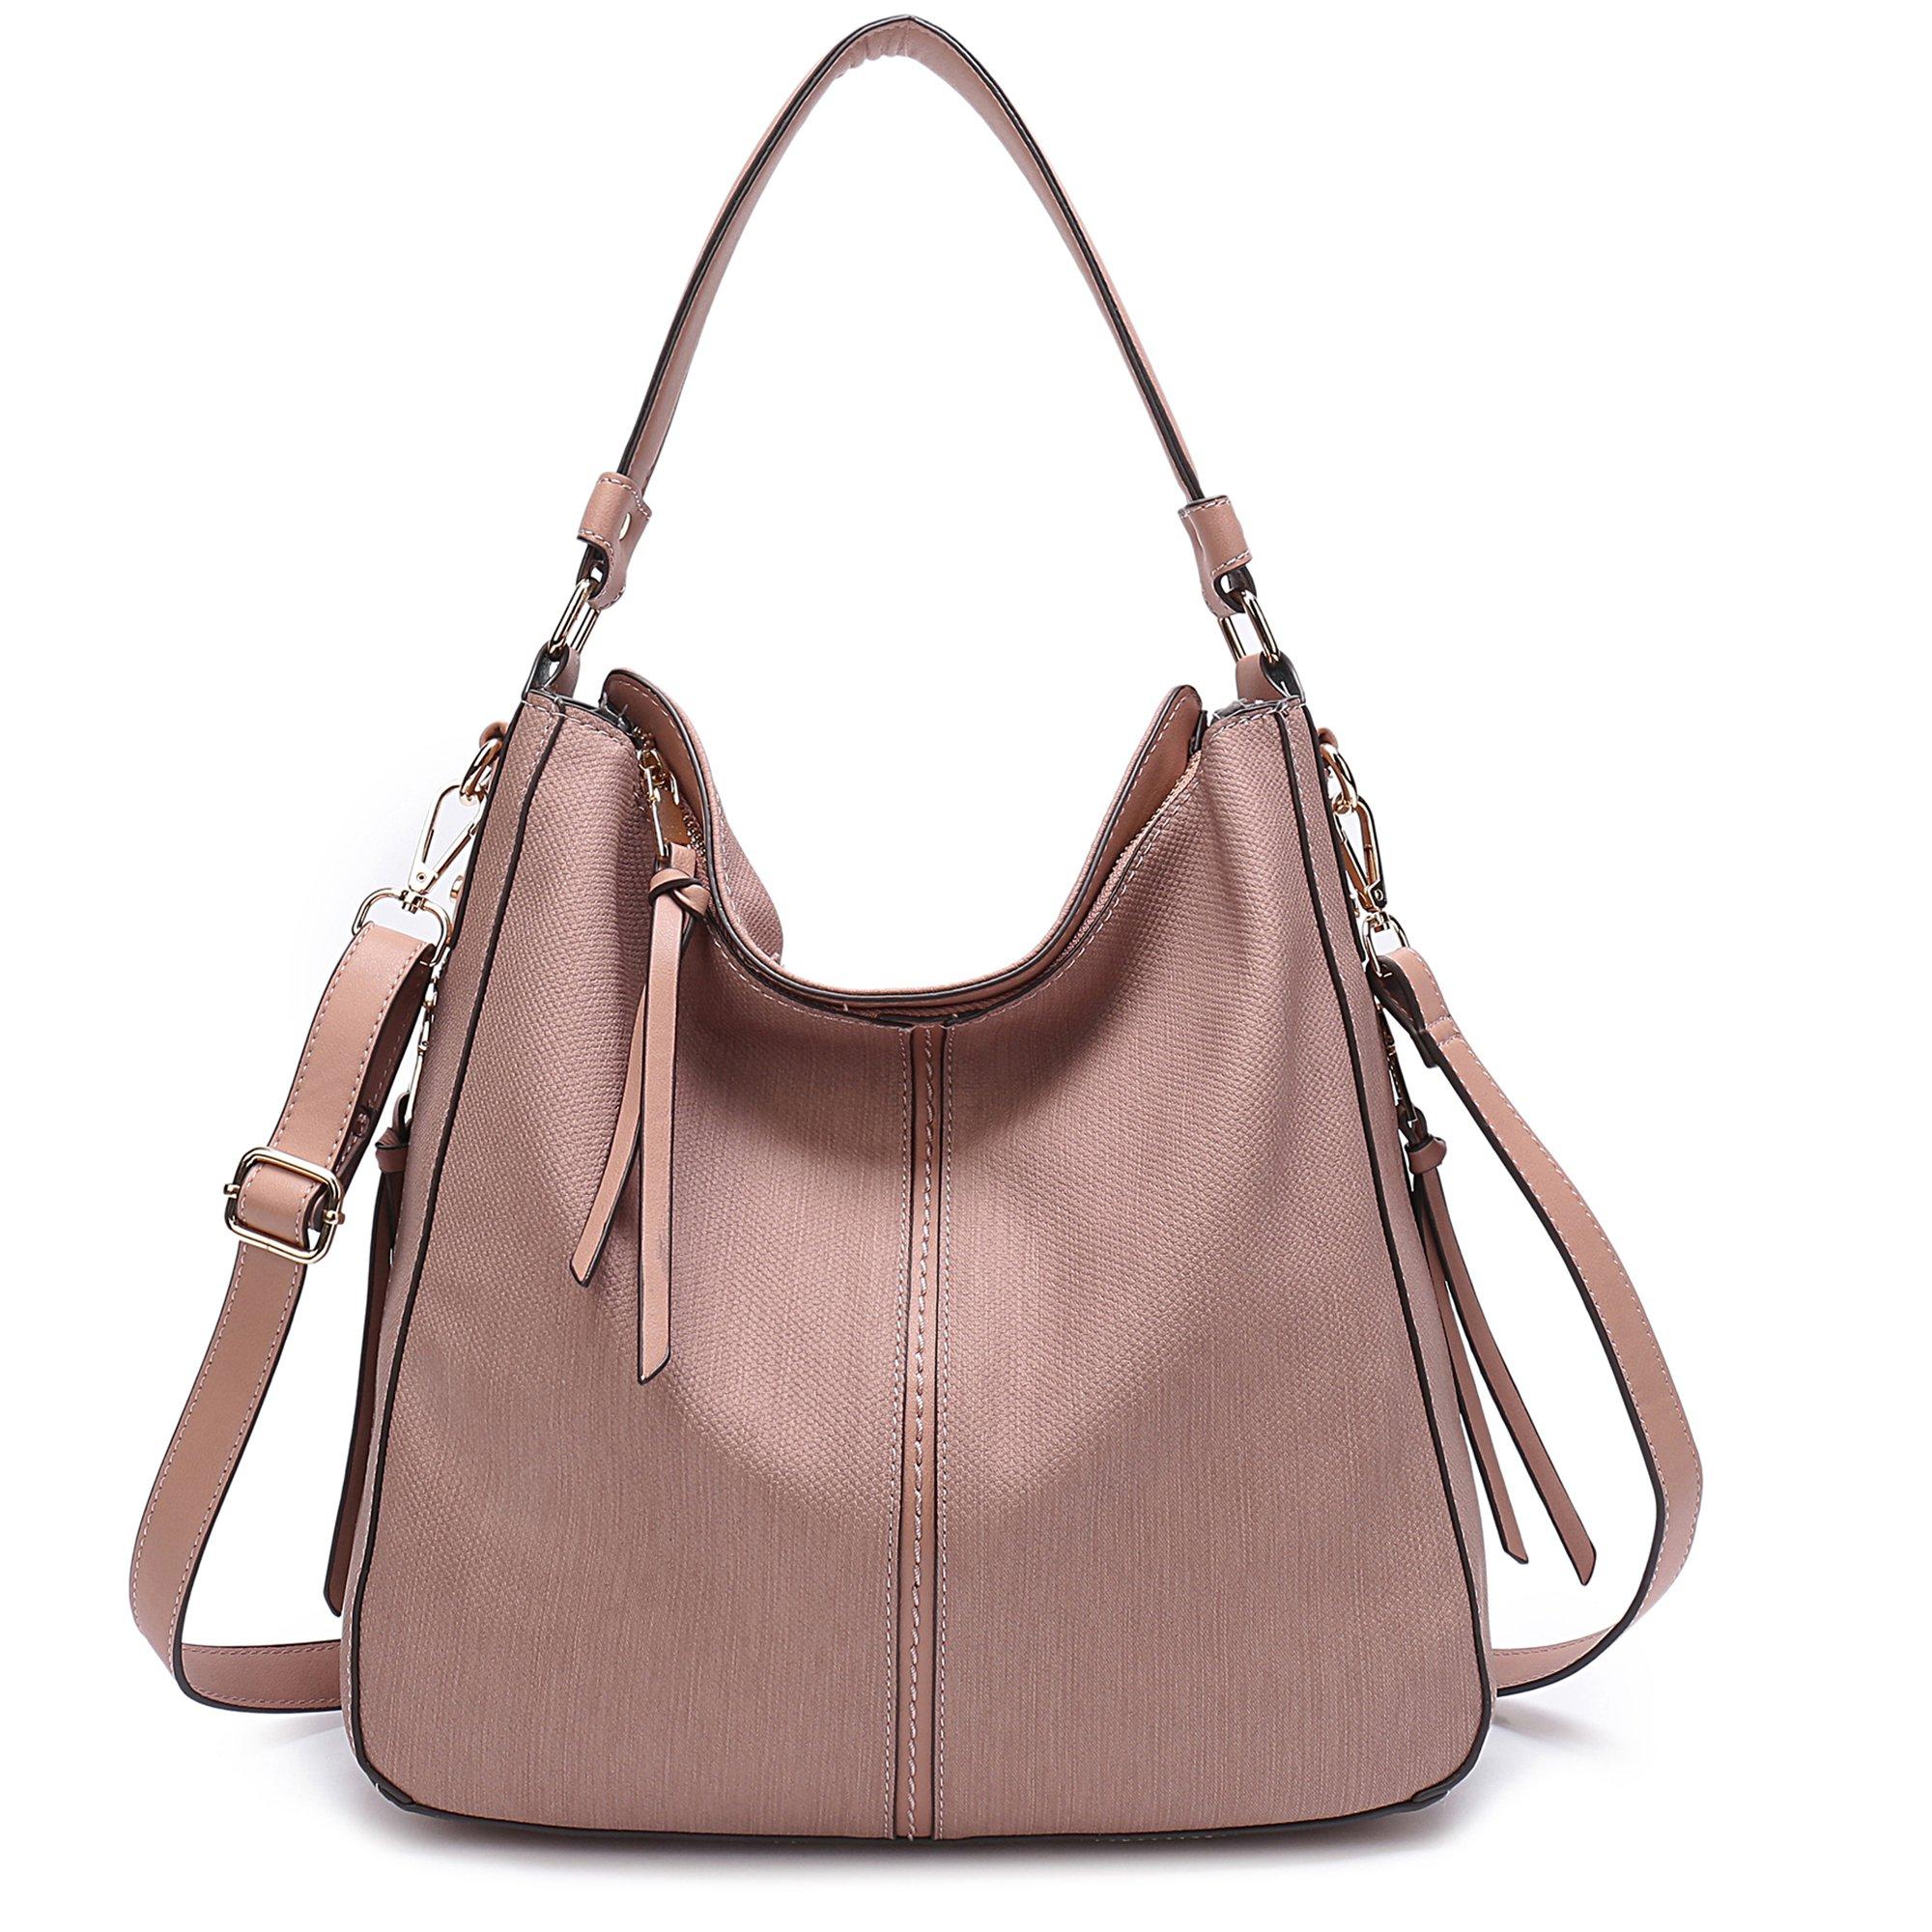 DDDH Vintage Hobo Handbags Shoulder Bags Durable Leather Tote Messenger Bags Bucket Bag For Women/Ladies/Girls (Pink-1)